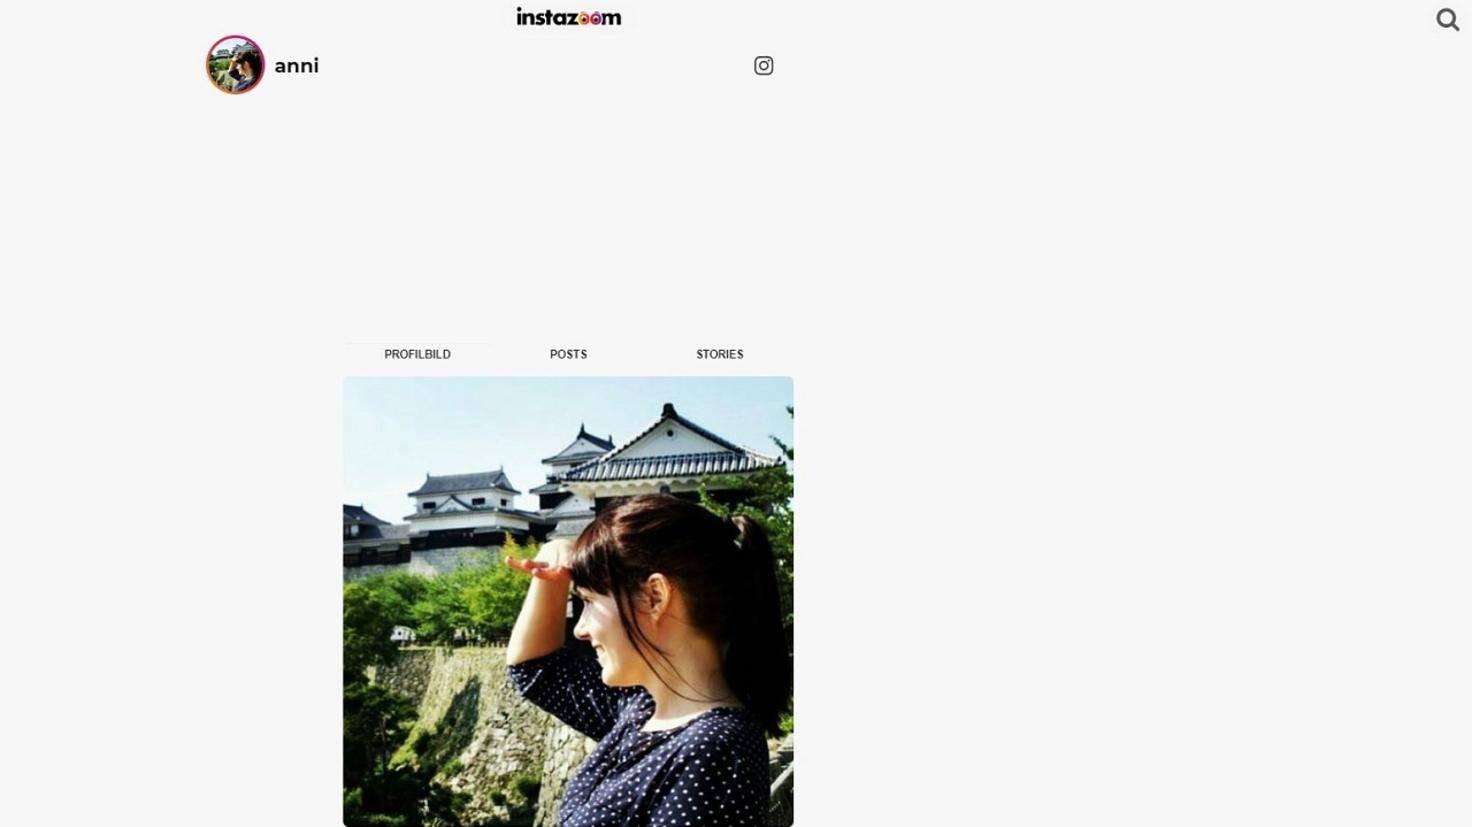 Instazoom Instagram Profilbild vergrößern